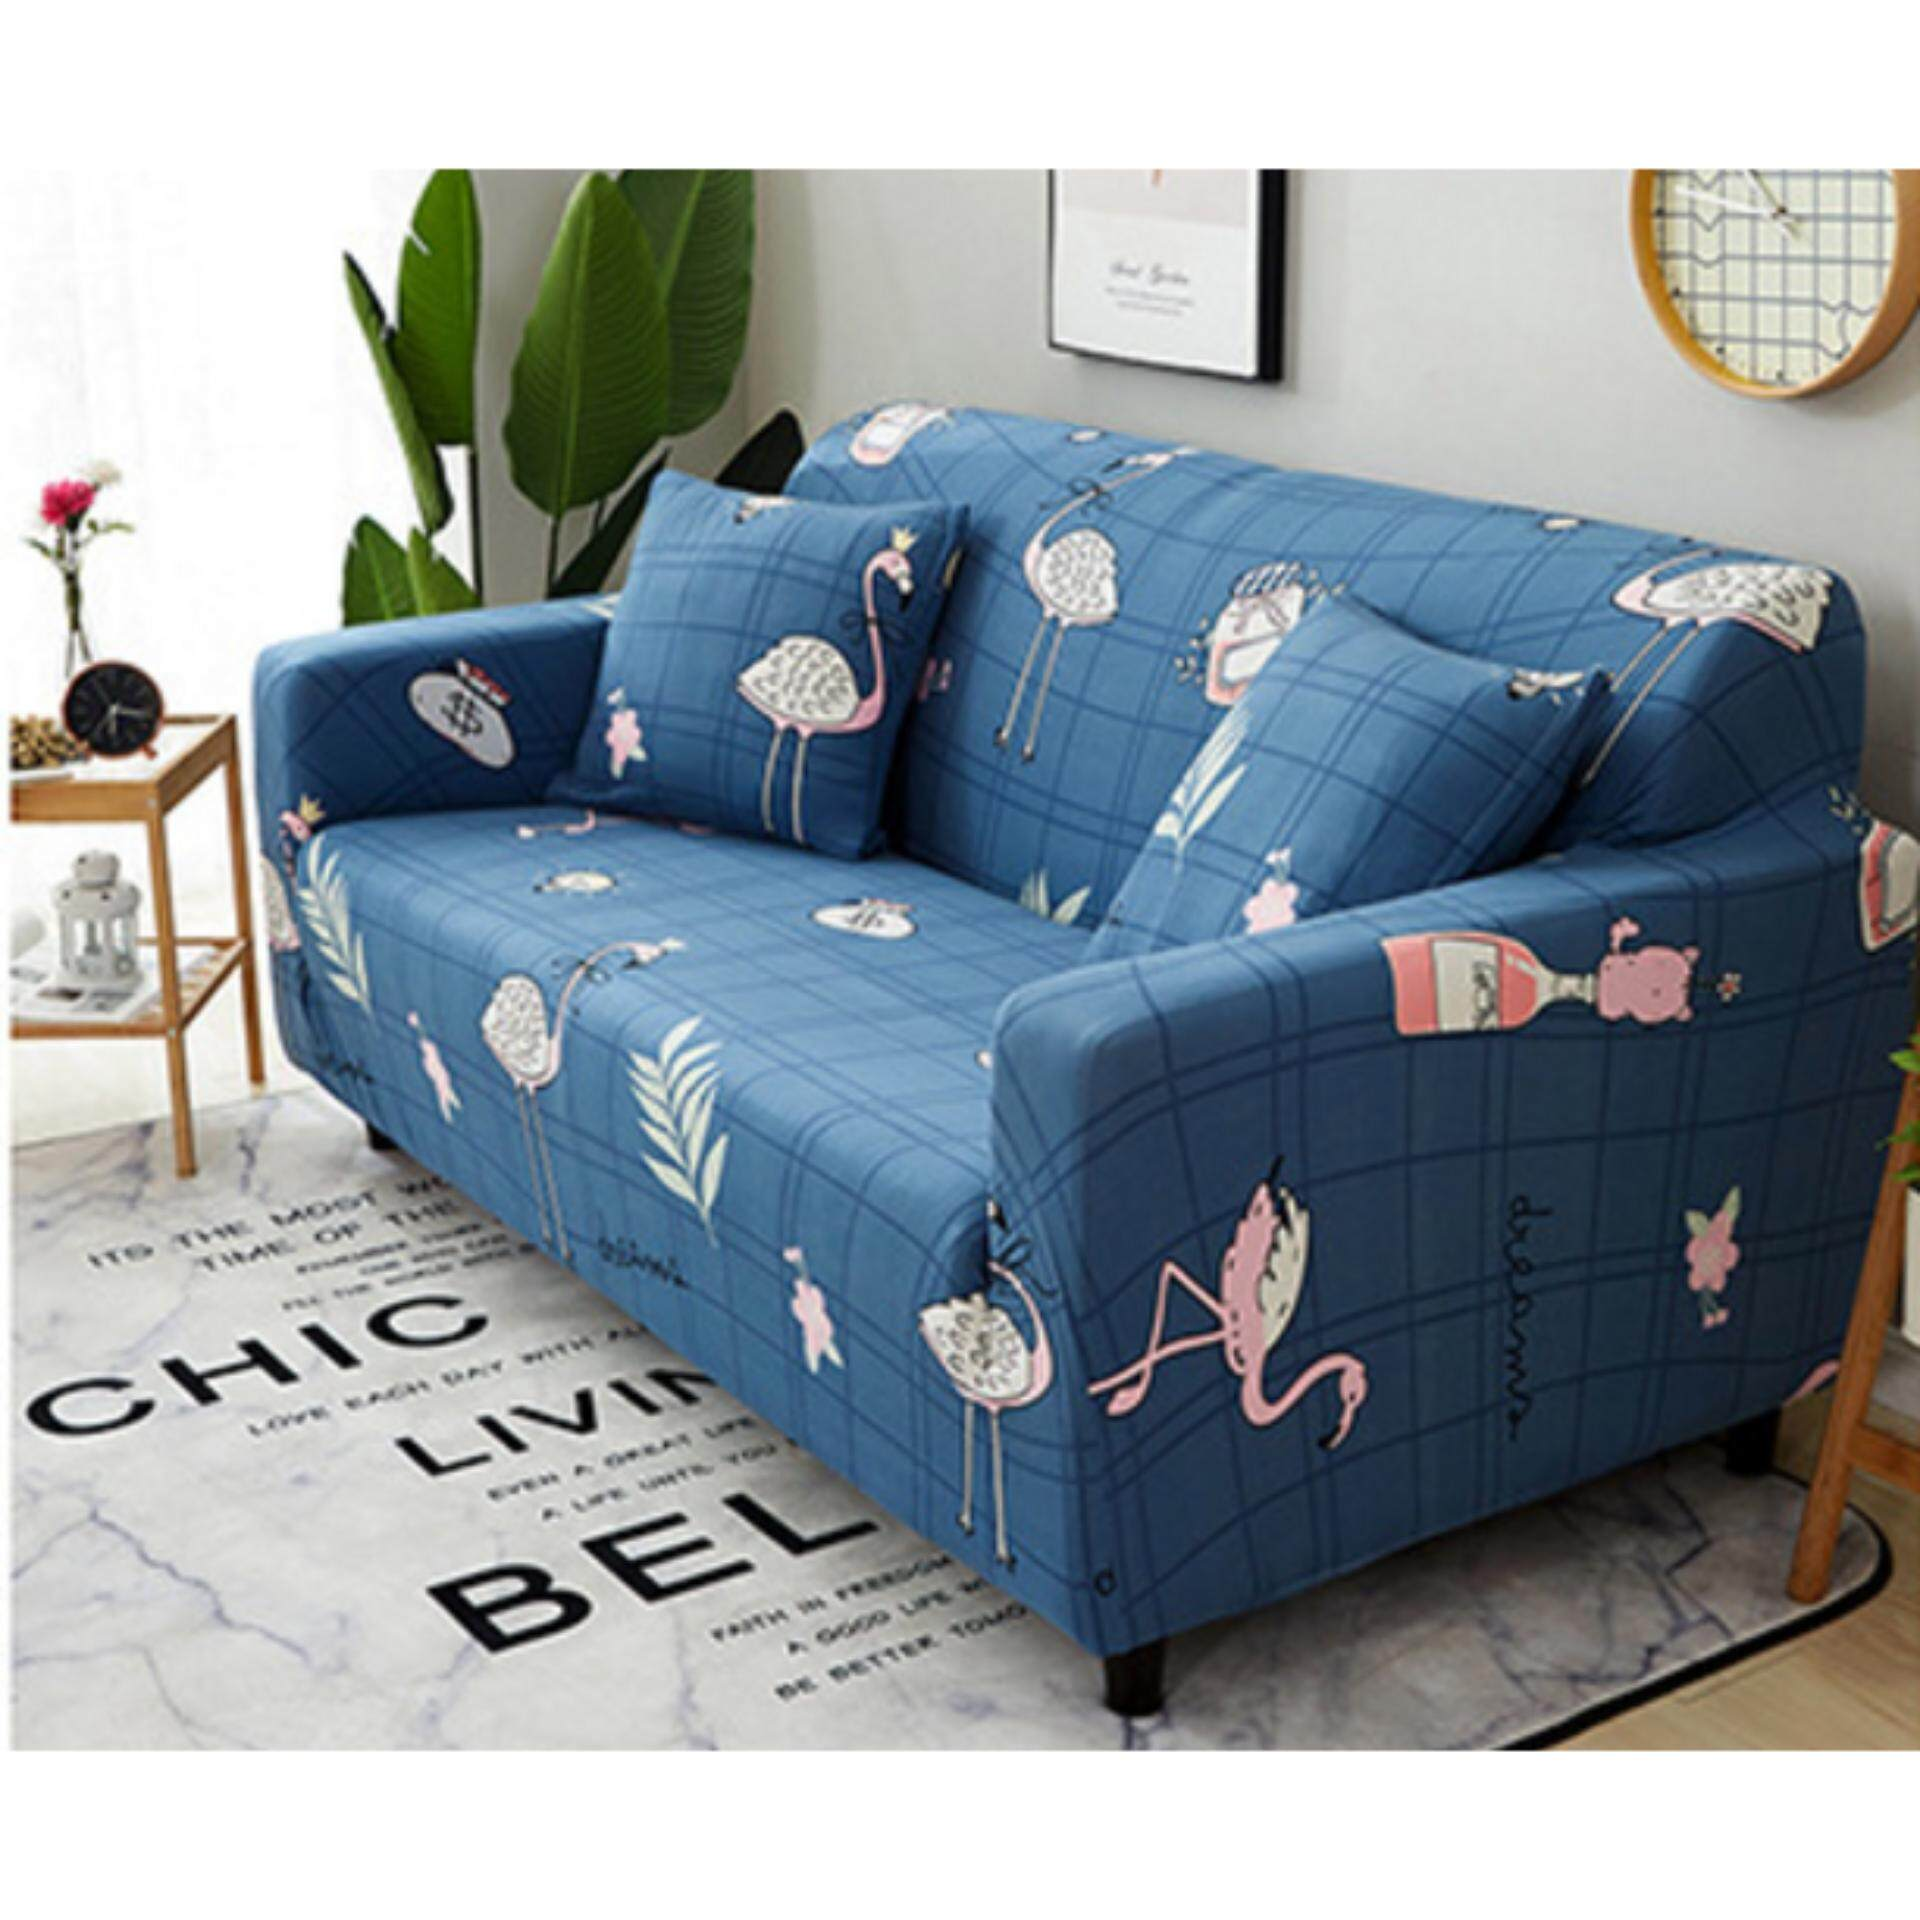 Nanarak ผ้าคลุมโซฟาsimple Four Seasons Elastic Sofa Cover (l :190-230cm) ฟรีผ้าคลุมหมอน By Nanarak.